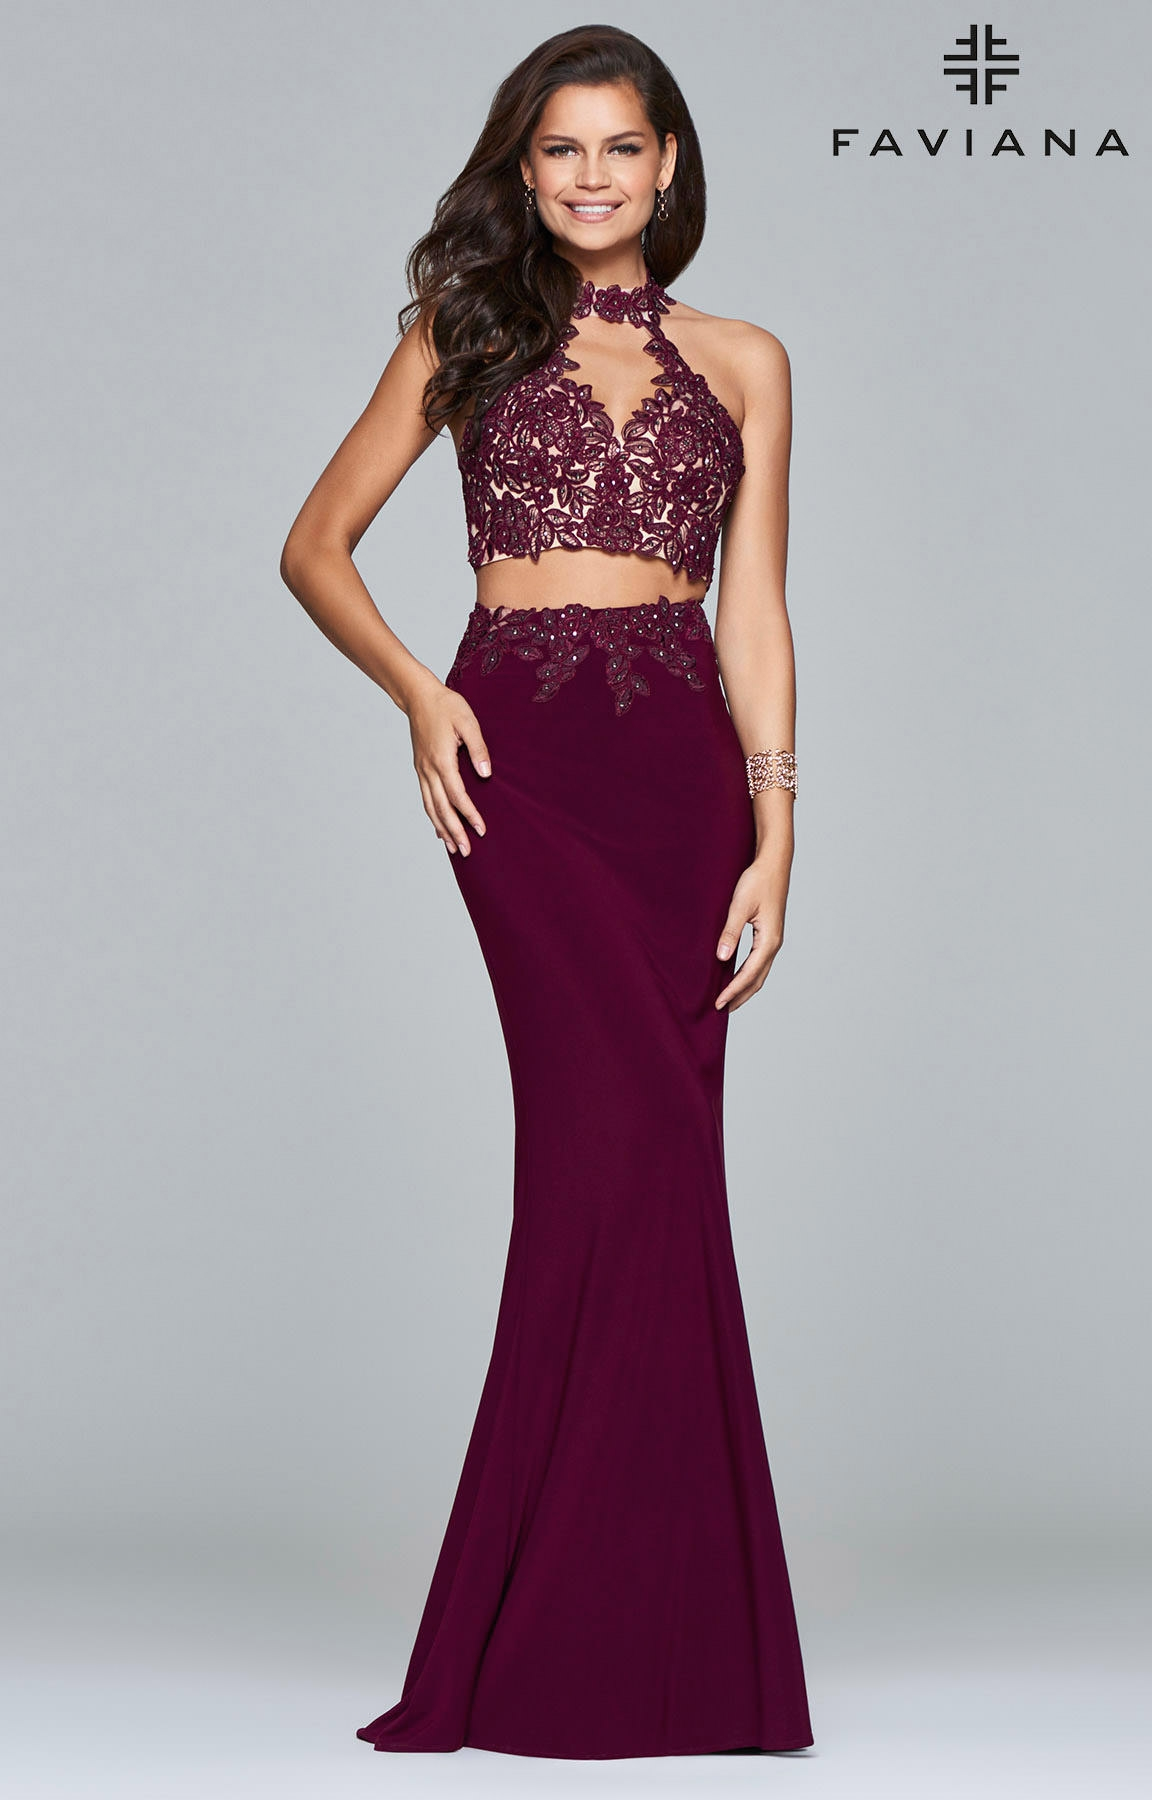 Jewel Tone Prom Dresses